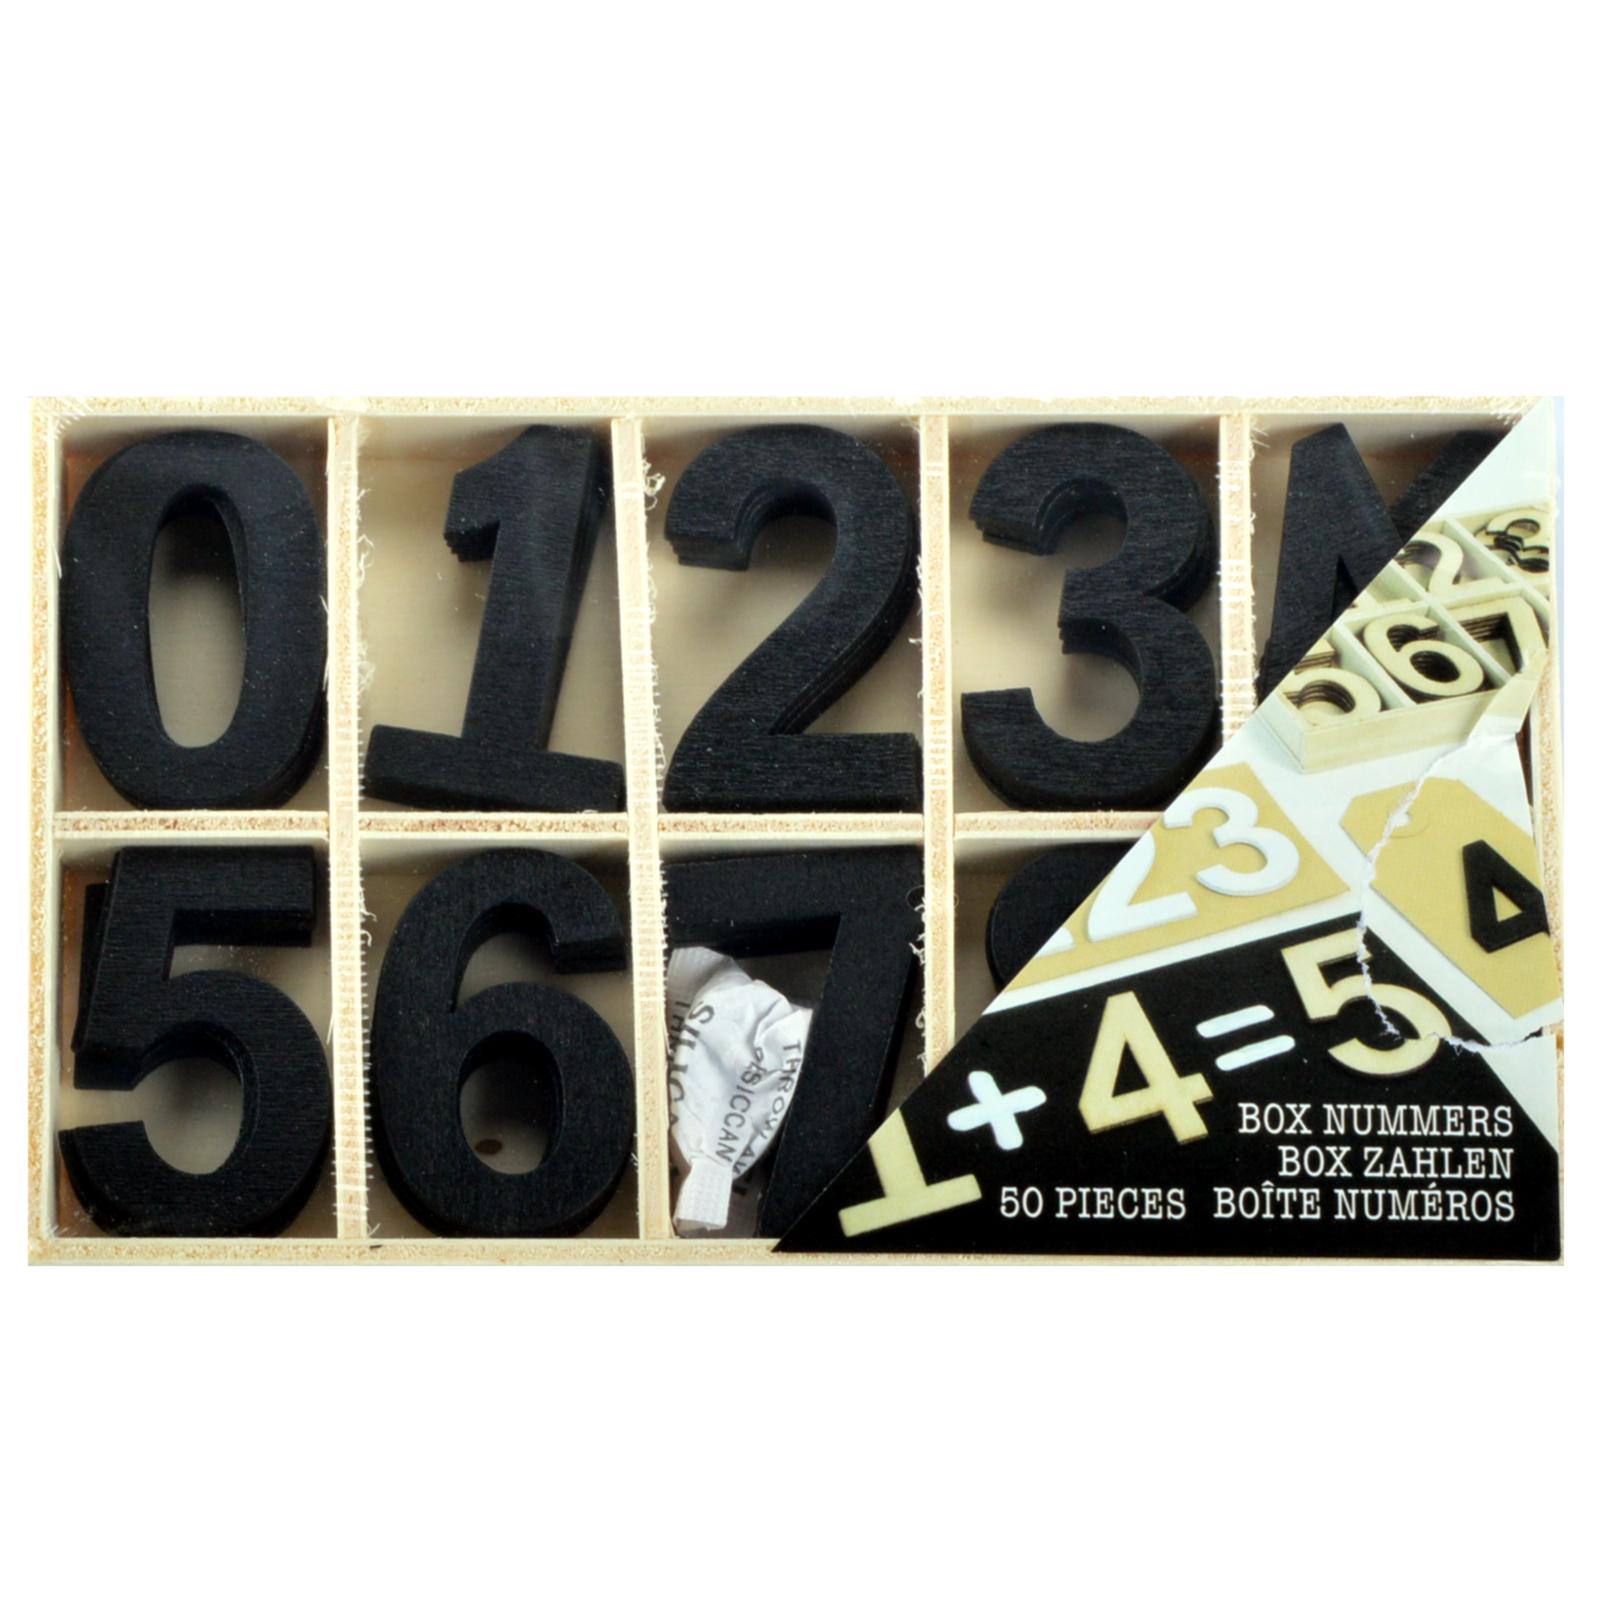 buchstaben holz holzbuchstaben zahlen shabby chic alphabet. Black Bedroom Furniture Sets. Home Design Ideas